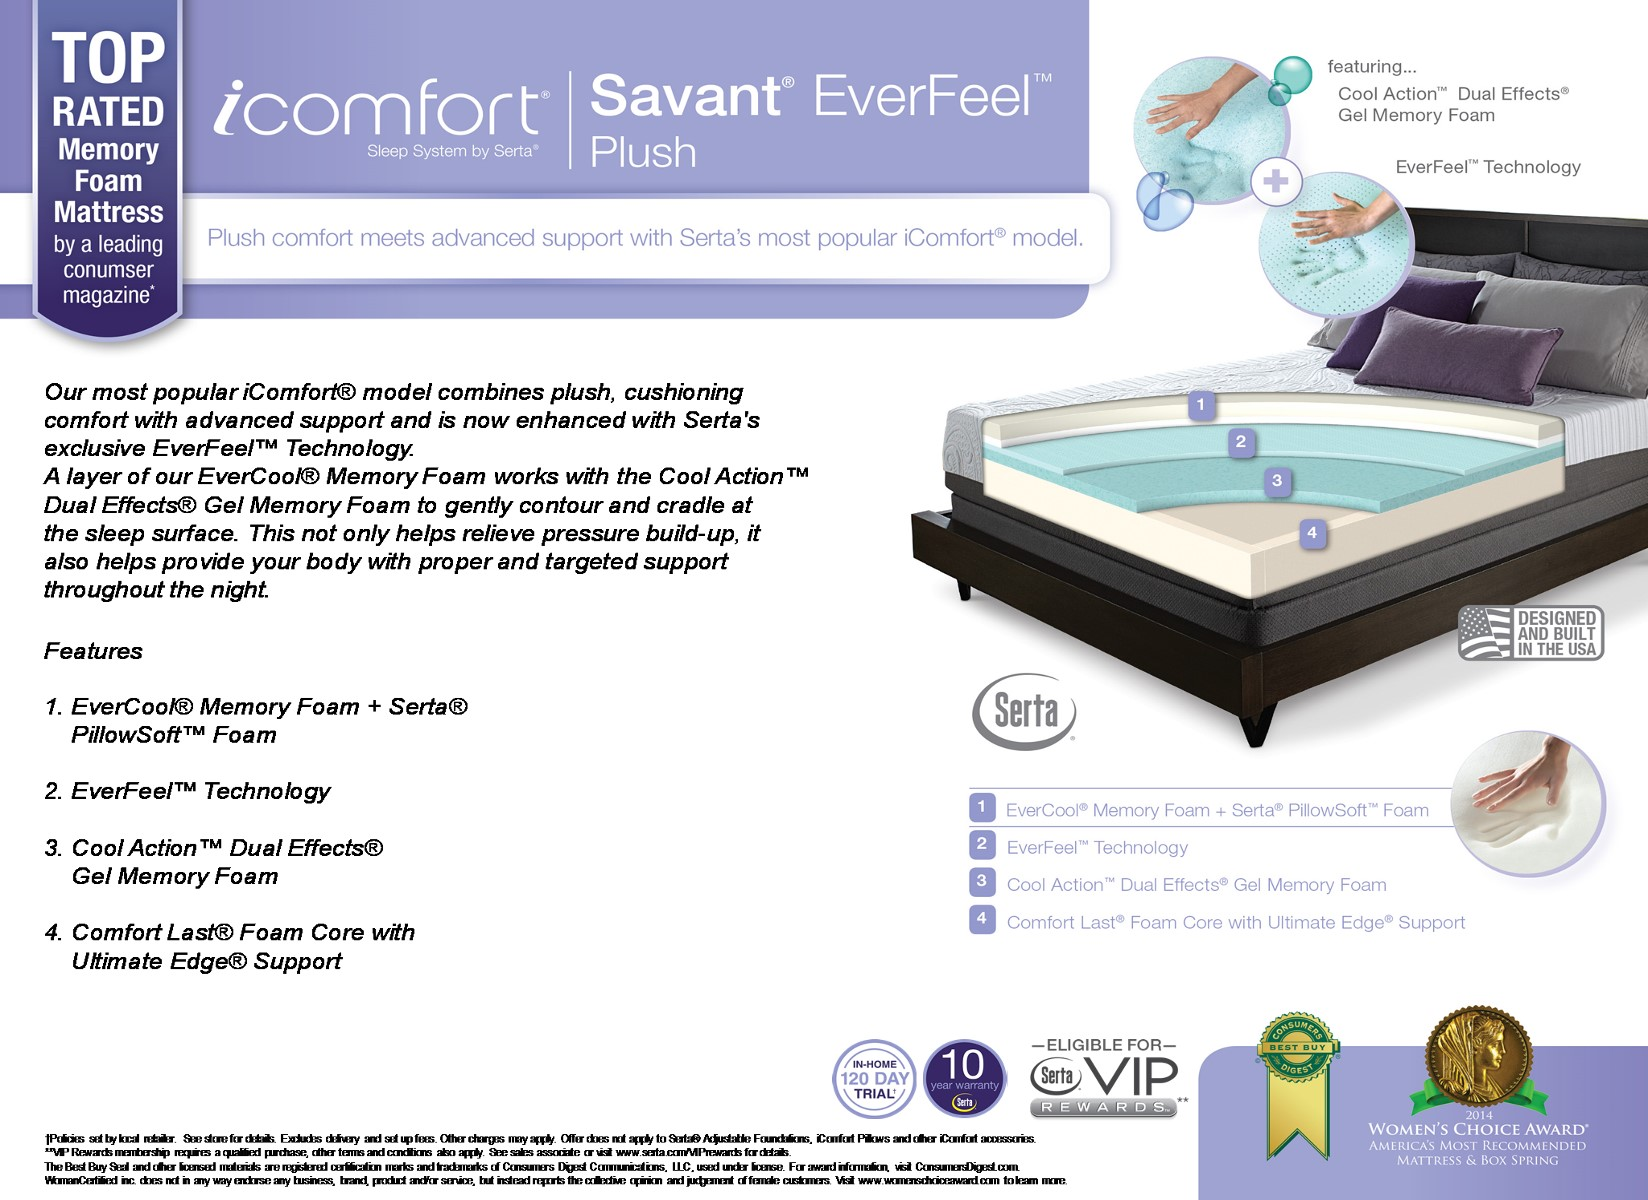 Savant Everfeel Plush